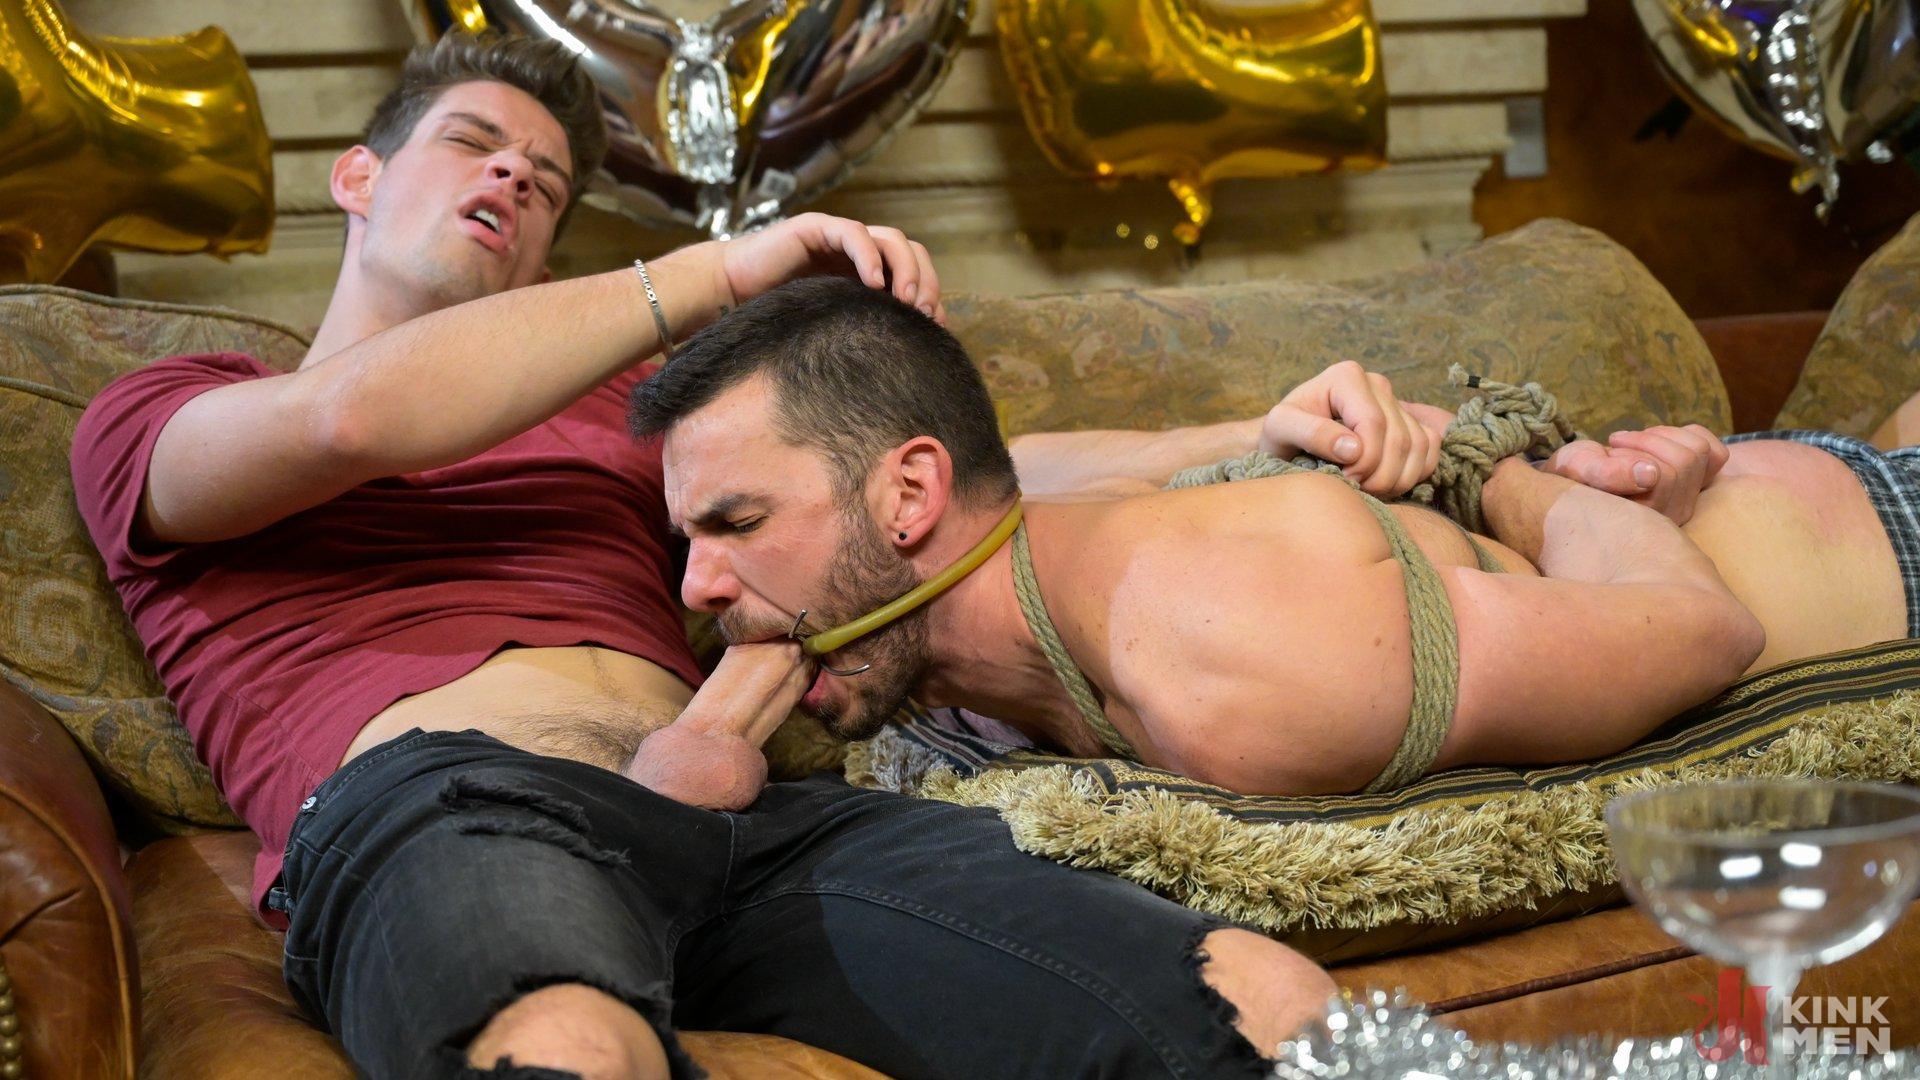 Photo number 8 from Homo Alone Part 2: Pizza Man Michael DelRay Punishes Vander Pulaski shot for Bound Gods on Kink.com. Featuring Michael DelRay and Vander Pulaski in hardcore BDSM & Fetish porn.